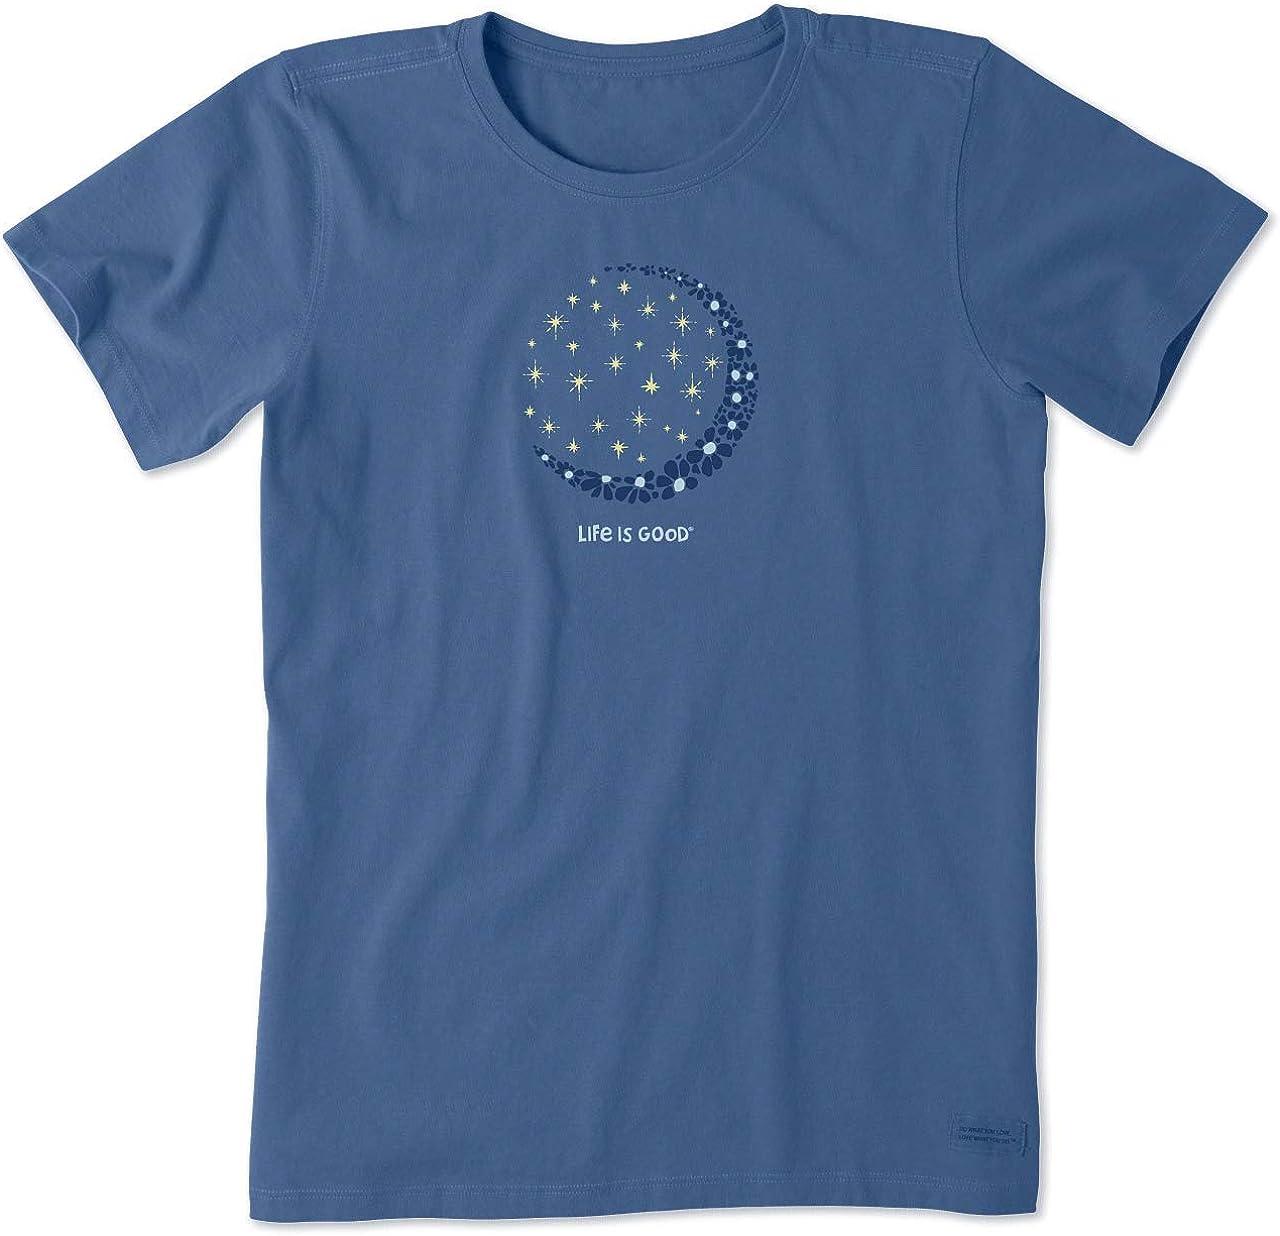 Life is Good Women's Crusher Graphic T-Shirt